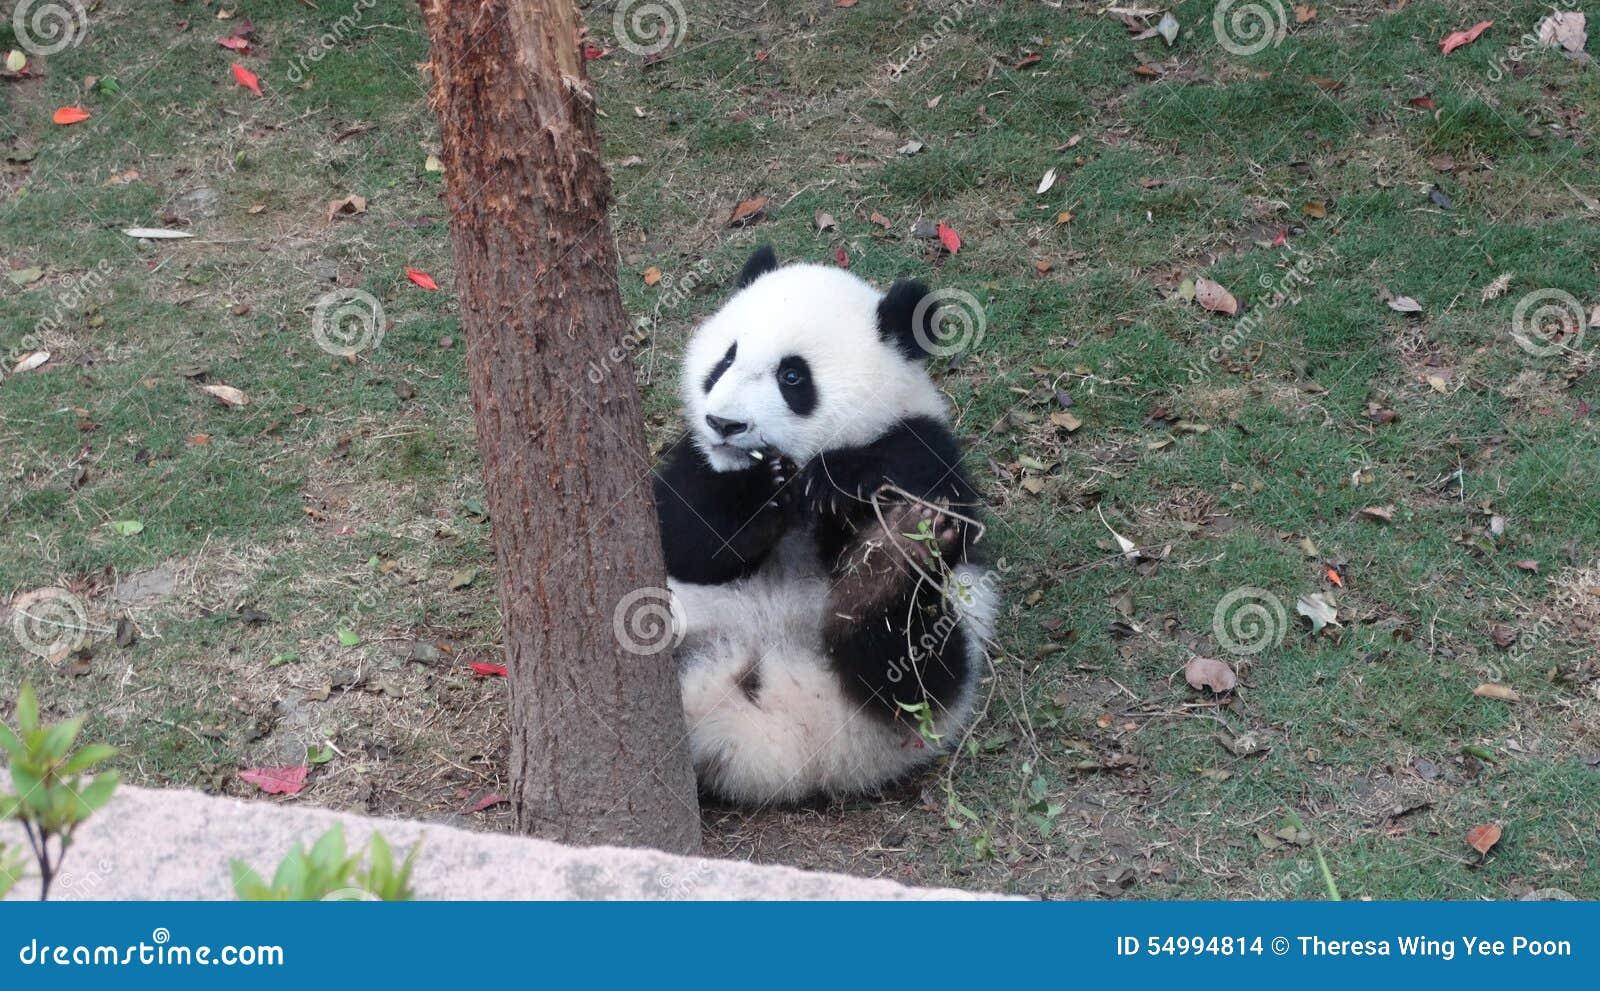 Babypanda die bamboebladeren in Sichuan Panda Reserve eet